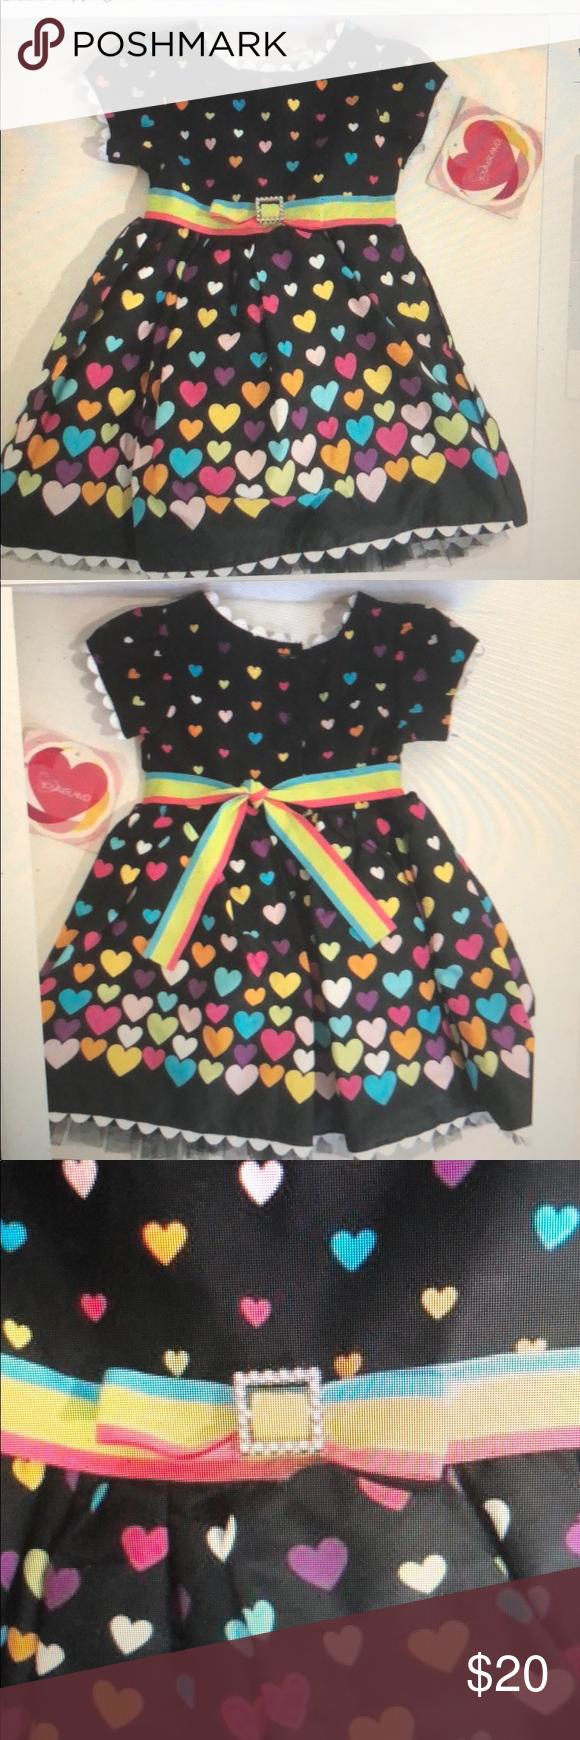 Little Black Dress Toddler Girl Kids Swimwear Girls Toddler Girl Dresses Cute Little Girl Dresses [ 5652 x 3768 Pixel ]